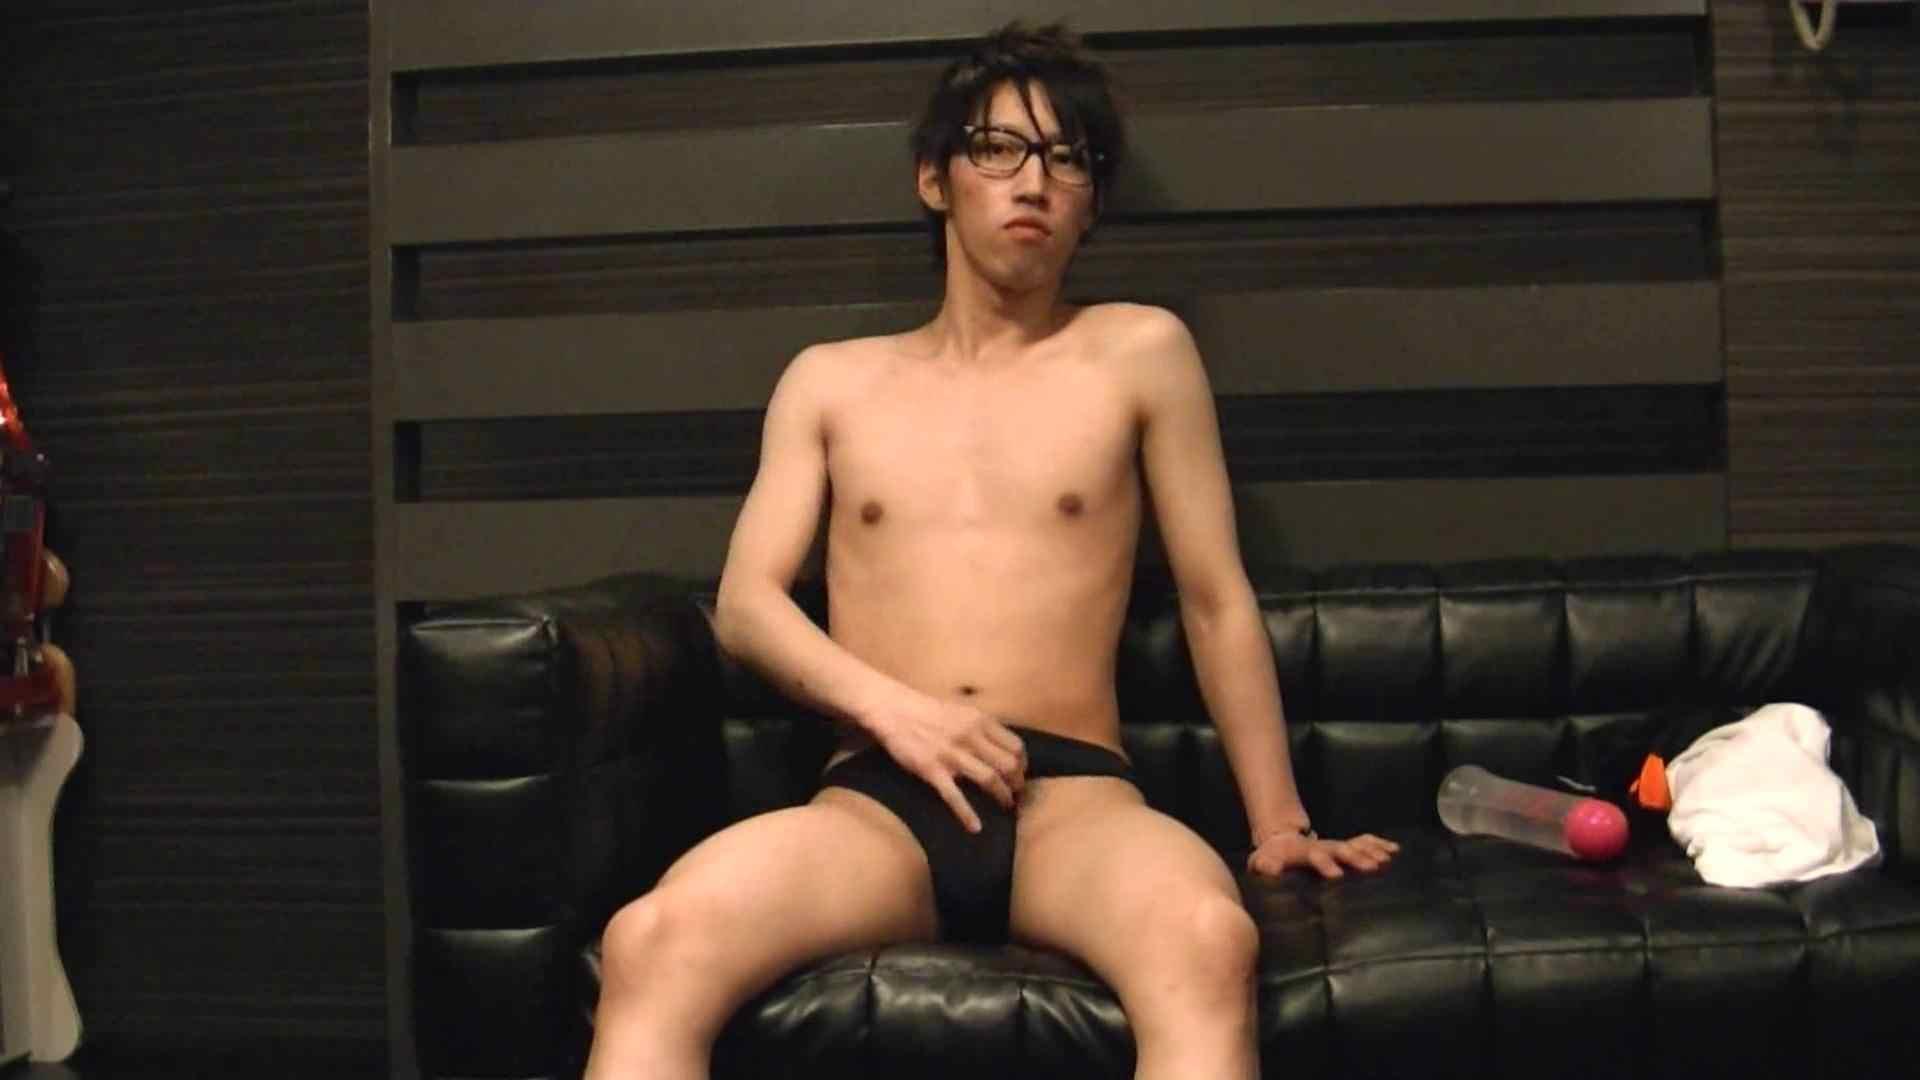 ONA見せカーニバル!! Vol3 男 ゲイ無料無修正画像 89枚 1